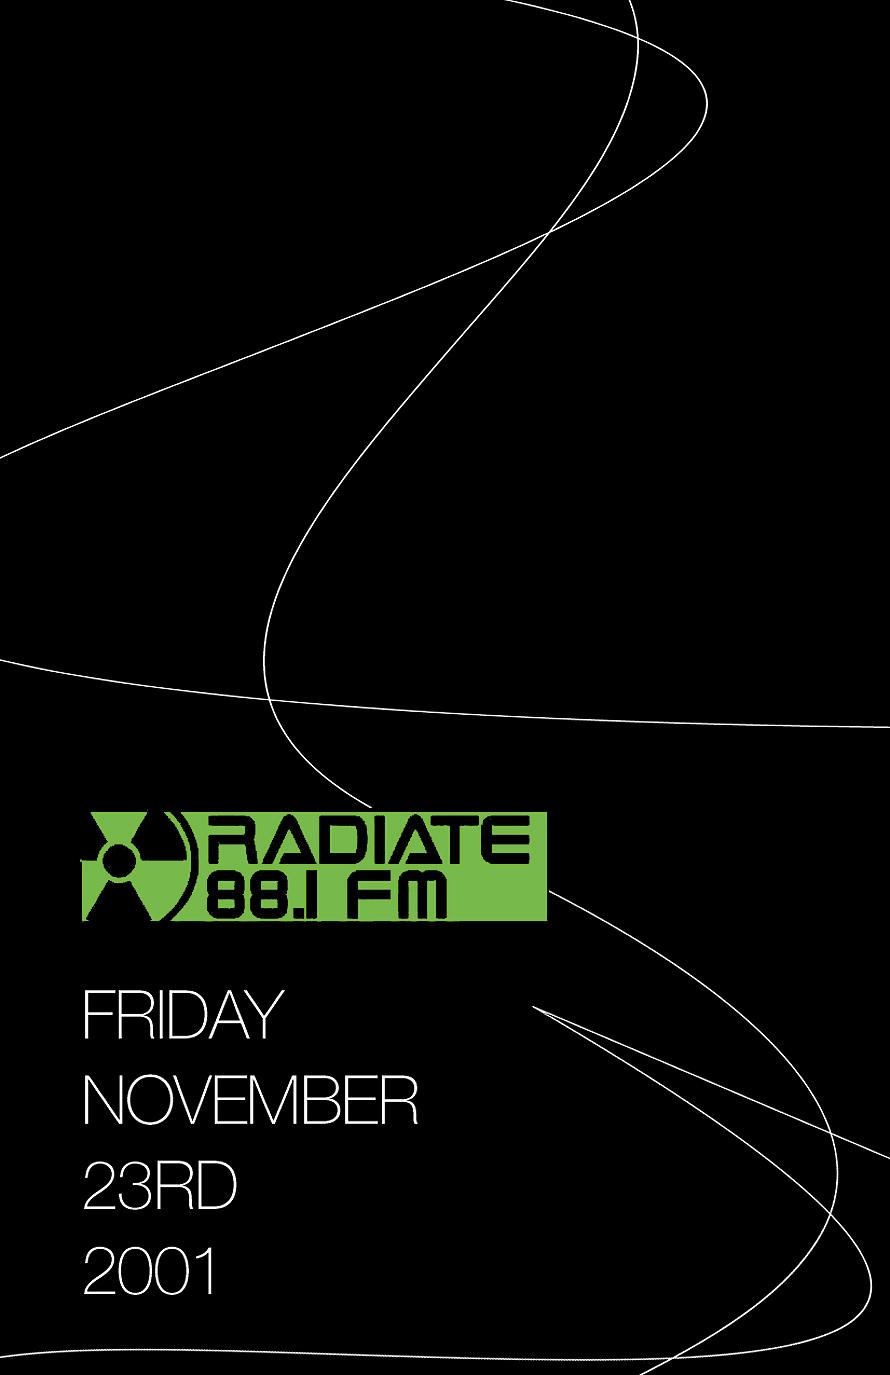 Radiate 88.1 FM Event at Club Space